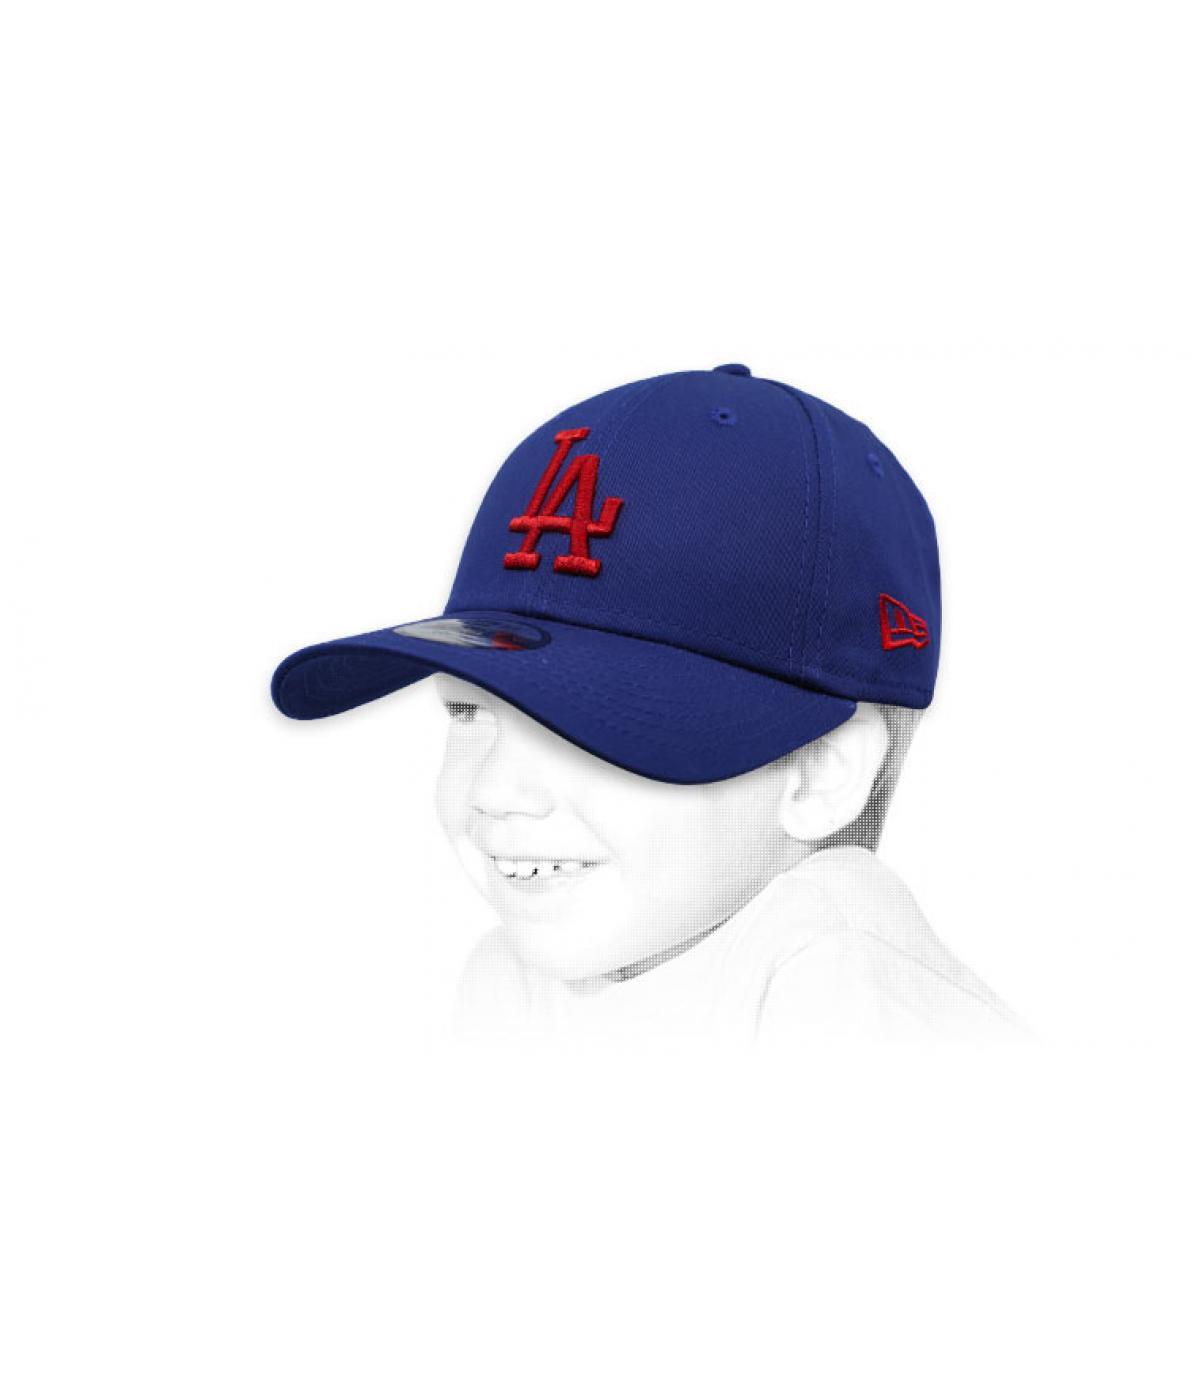 gorra infantil LA azul rojo